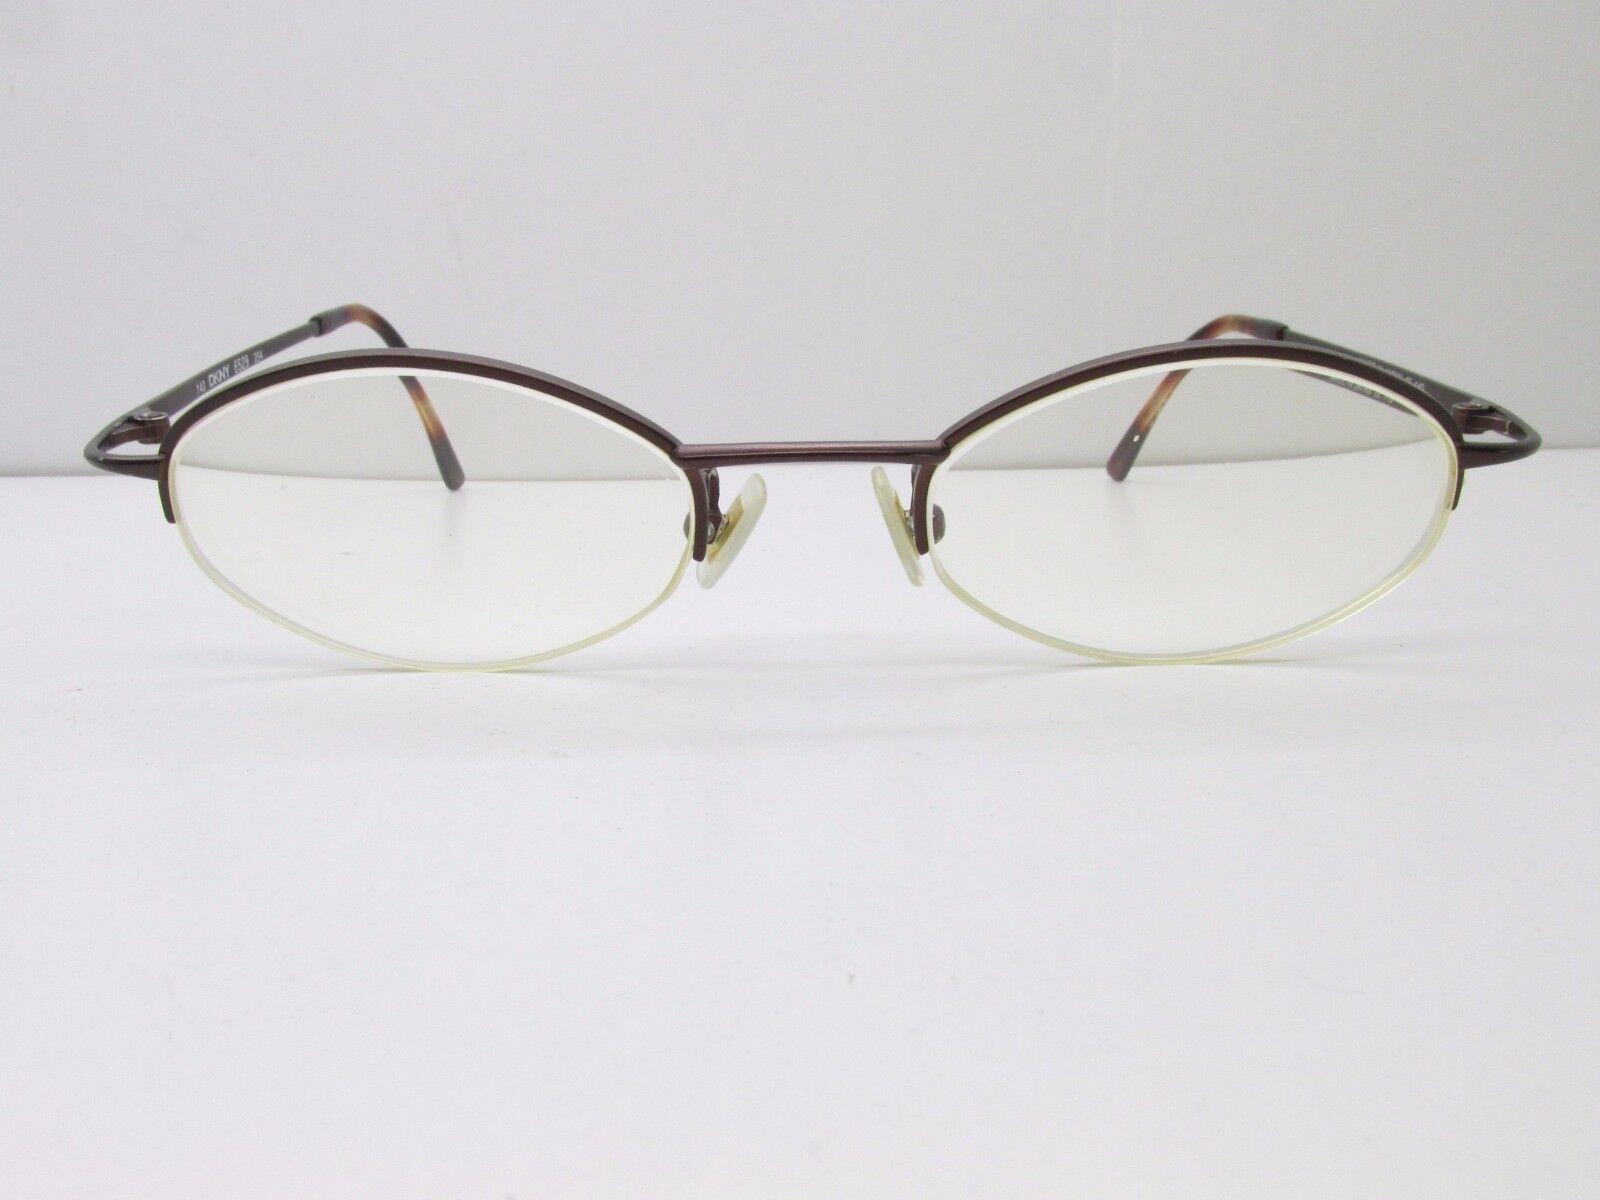 Groß Pictures Of Eyeglasses Frames Bilder - Rahmen Ideen ...